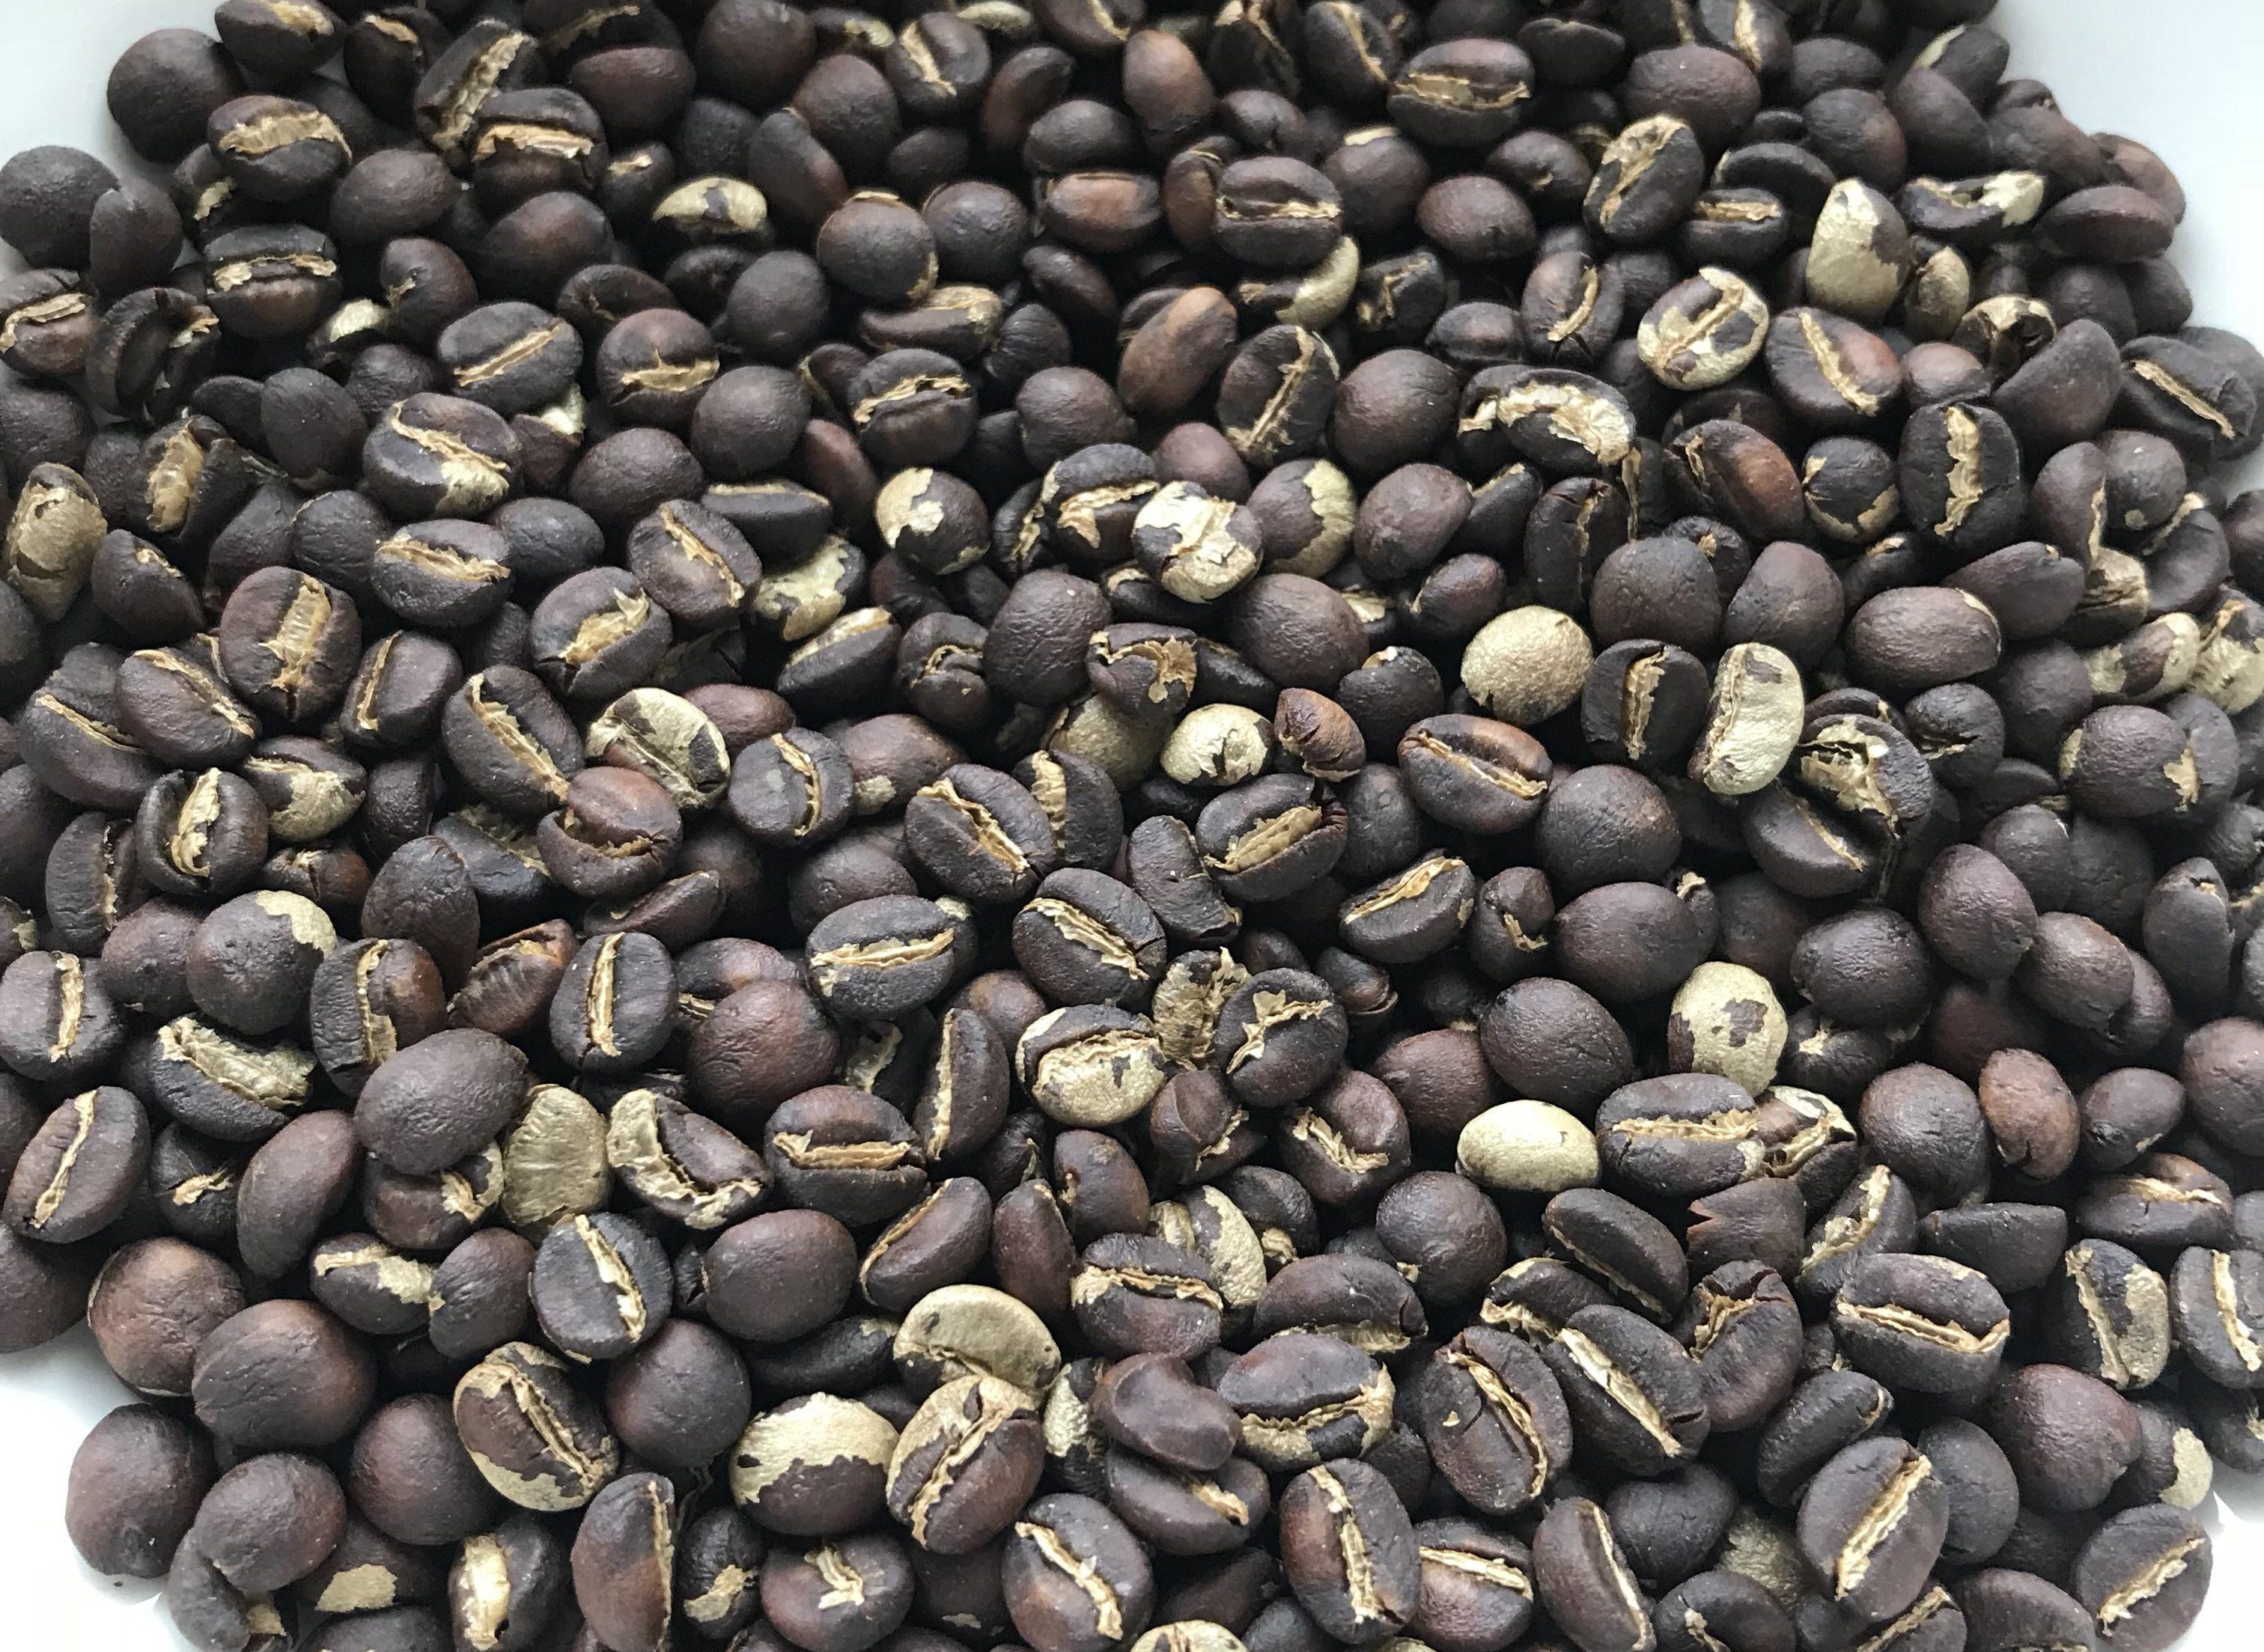 Coffee – Pete Denison